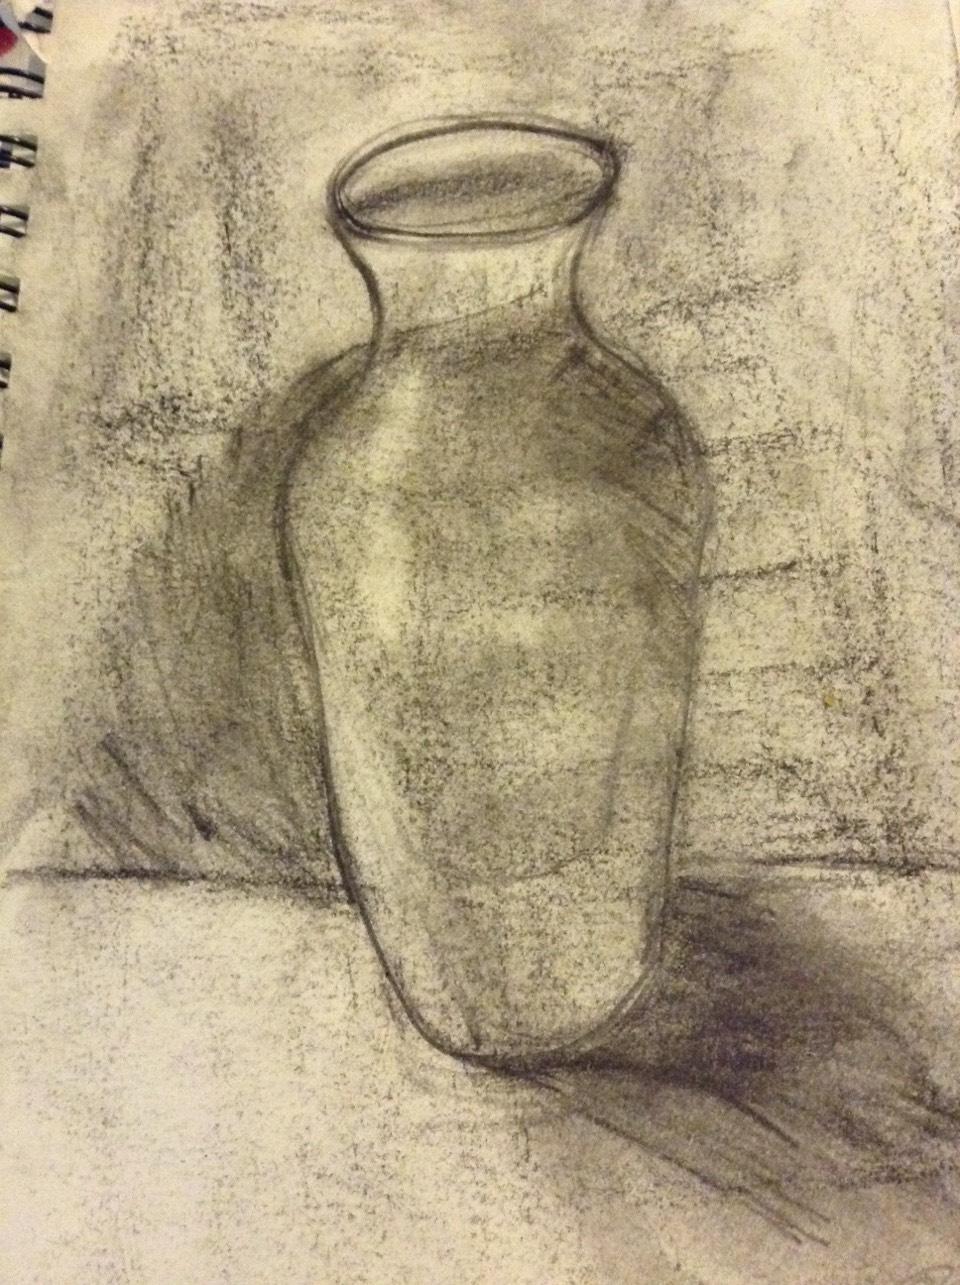 This is a pot. I kinda drew it in a hurry so it isnt that good